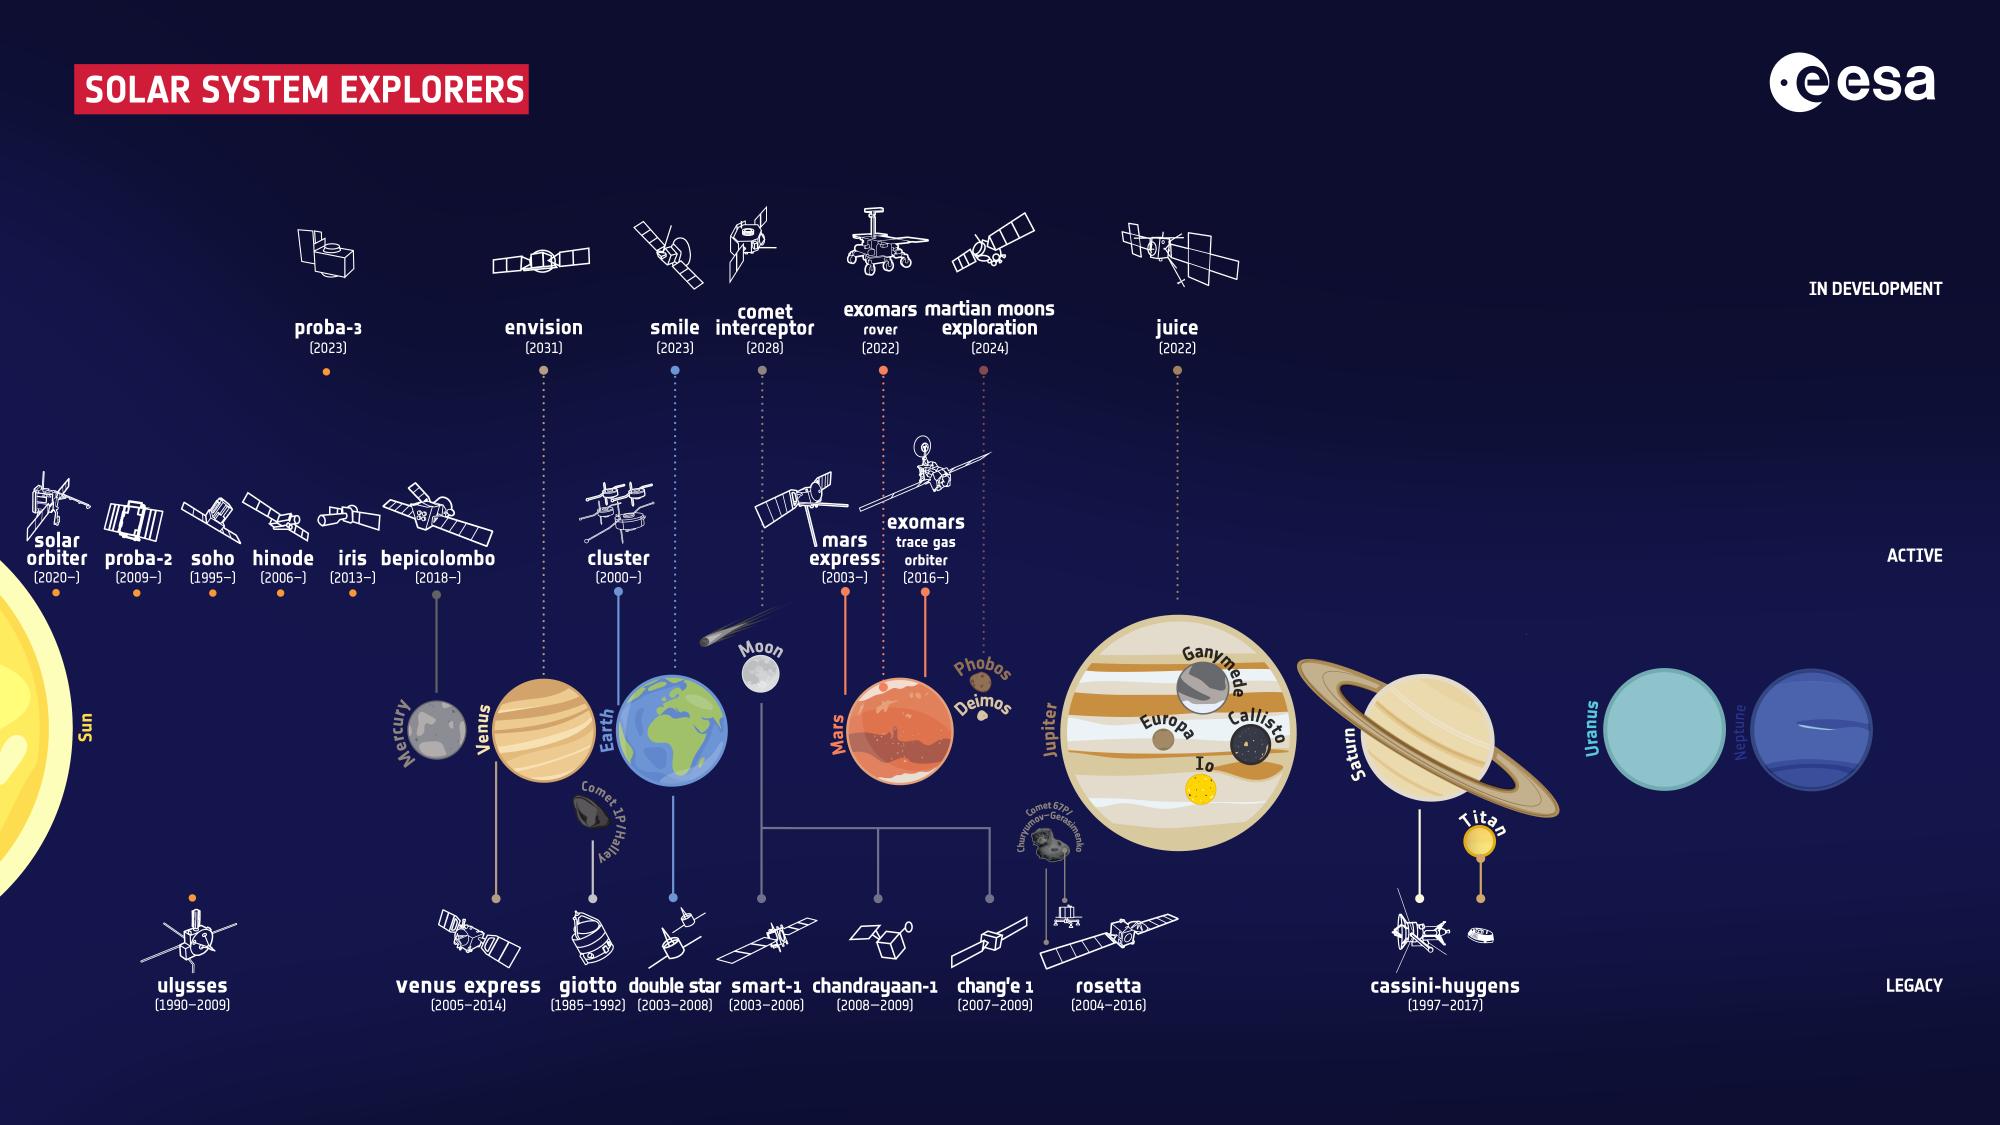 ESA_fleet_of_Solar_System_explorers_2021_2k.png